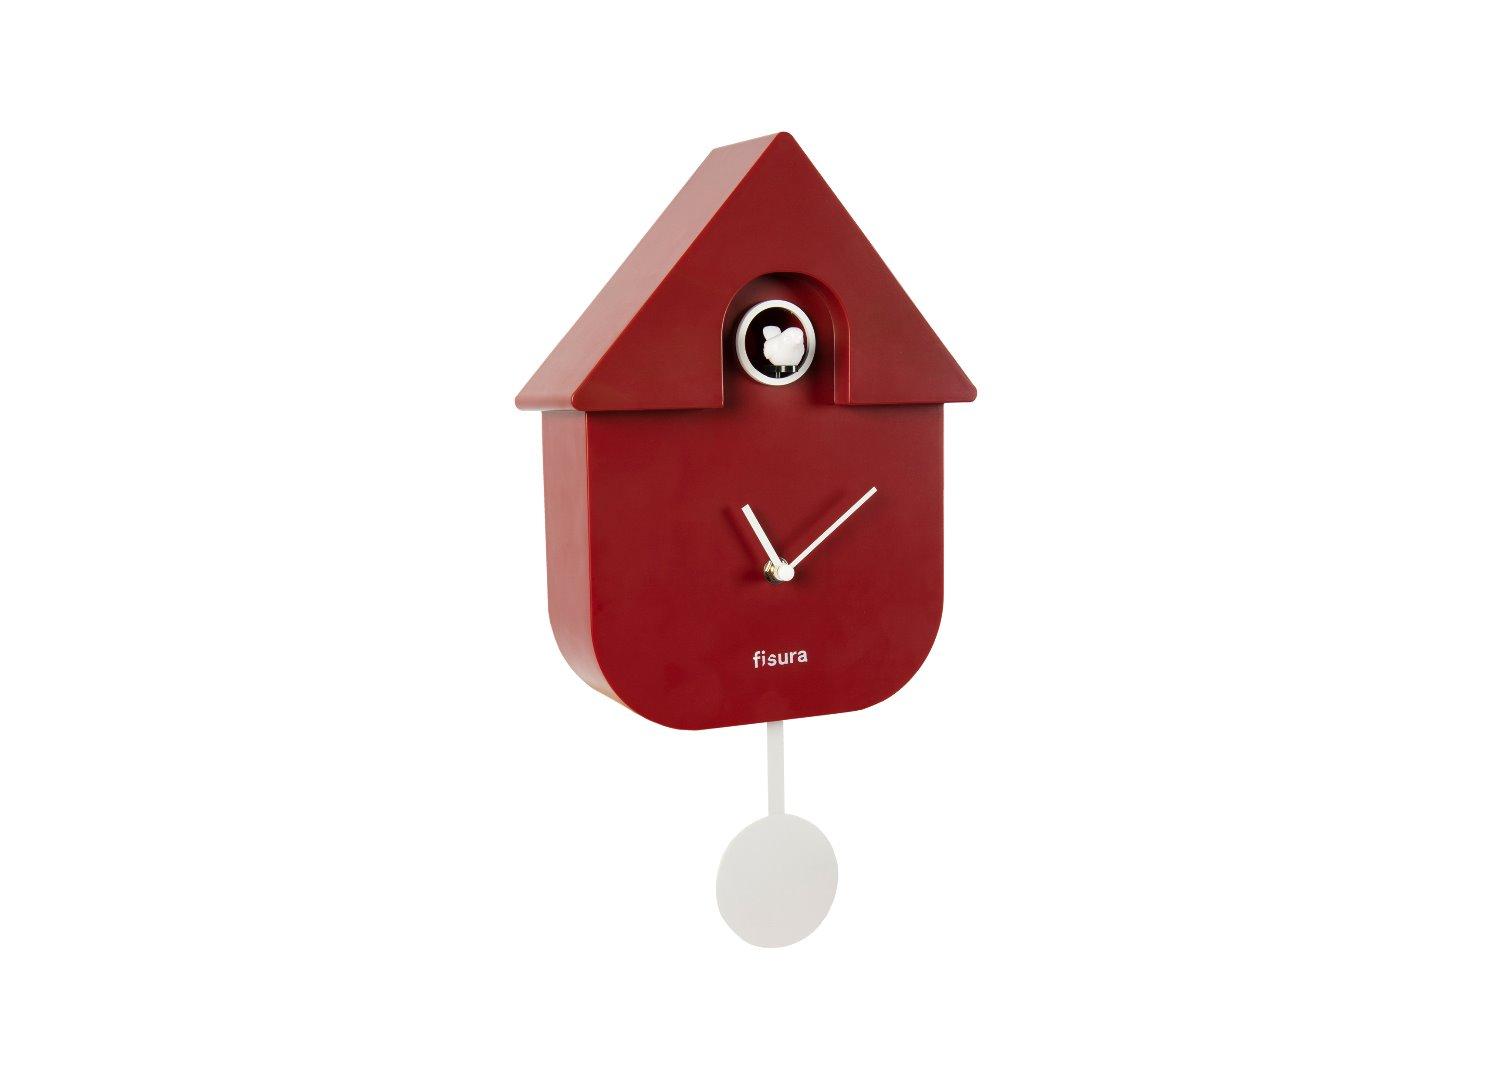 De Fisura Cuco Reloj Casa Pared Rojoblanco OPTXkZuwi